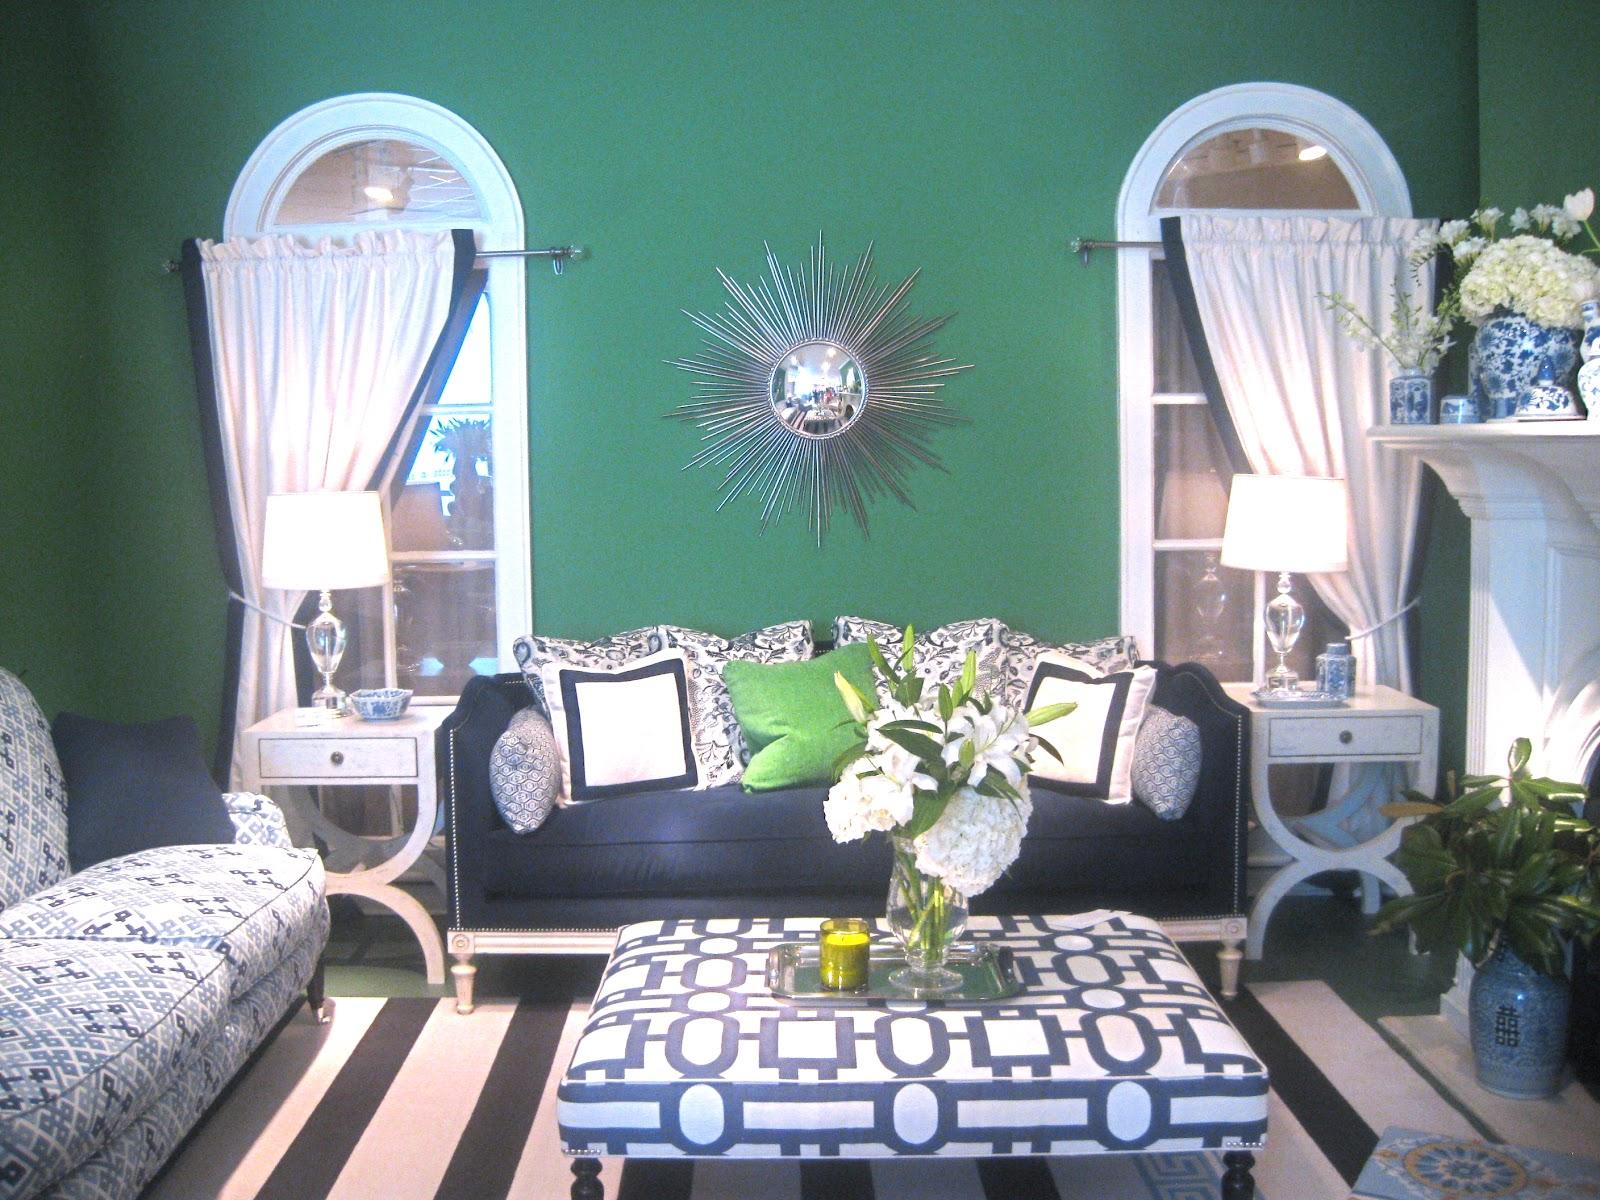 Dovecote Decor High Point Furniture Market Top Designer Showrooms